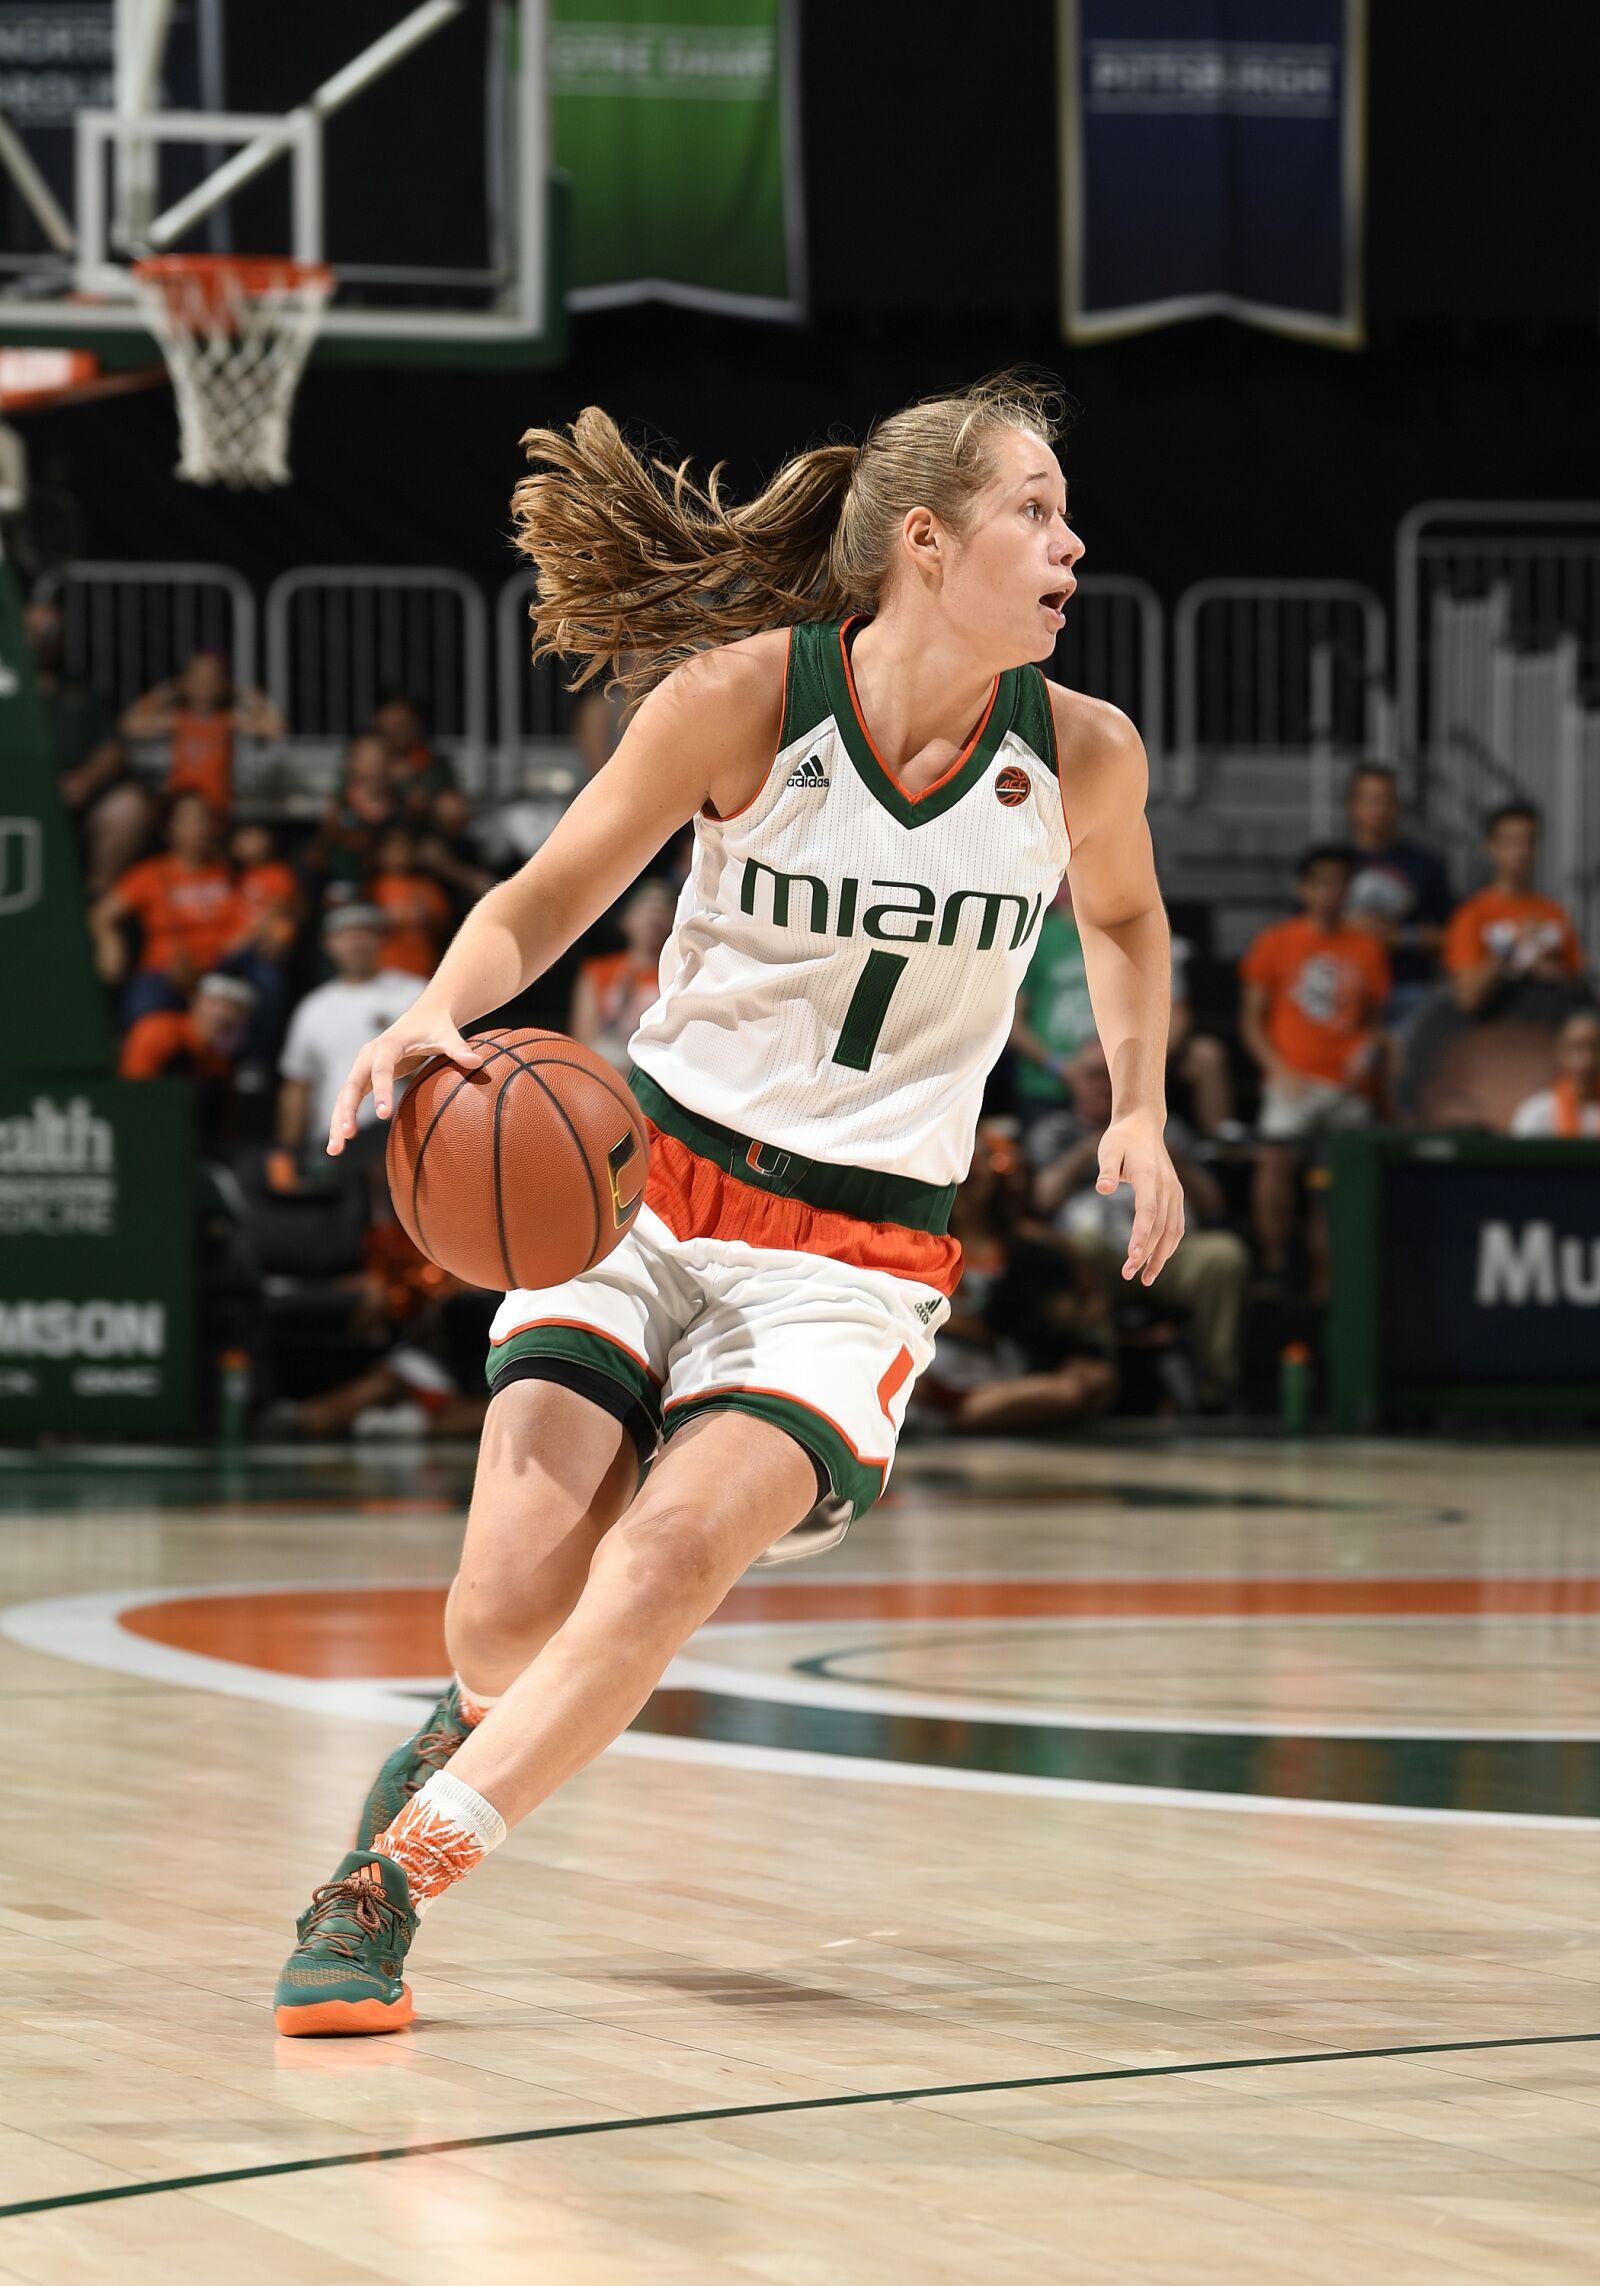 WNBA Draft: Miami's Cornelius foregoes final year of eligibility to pursue pro career